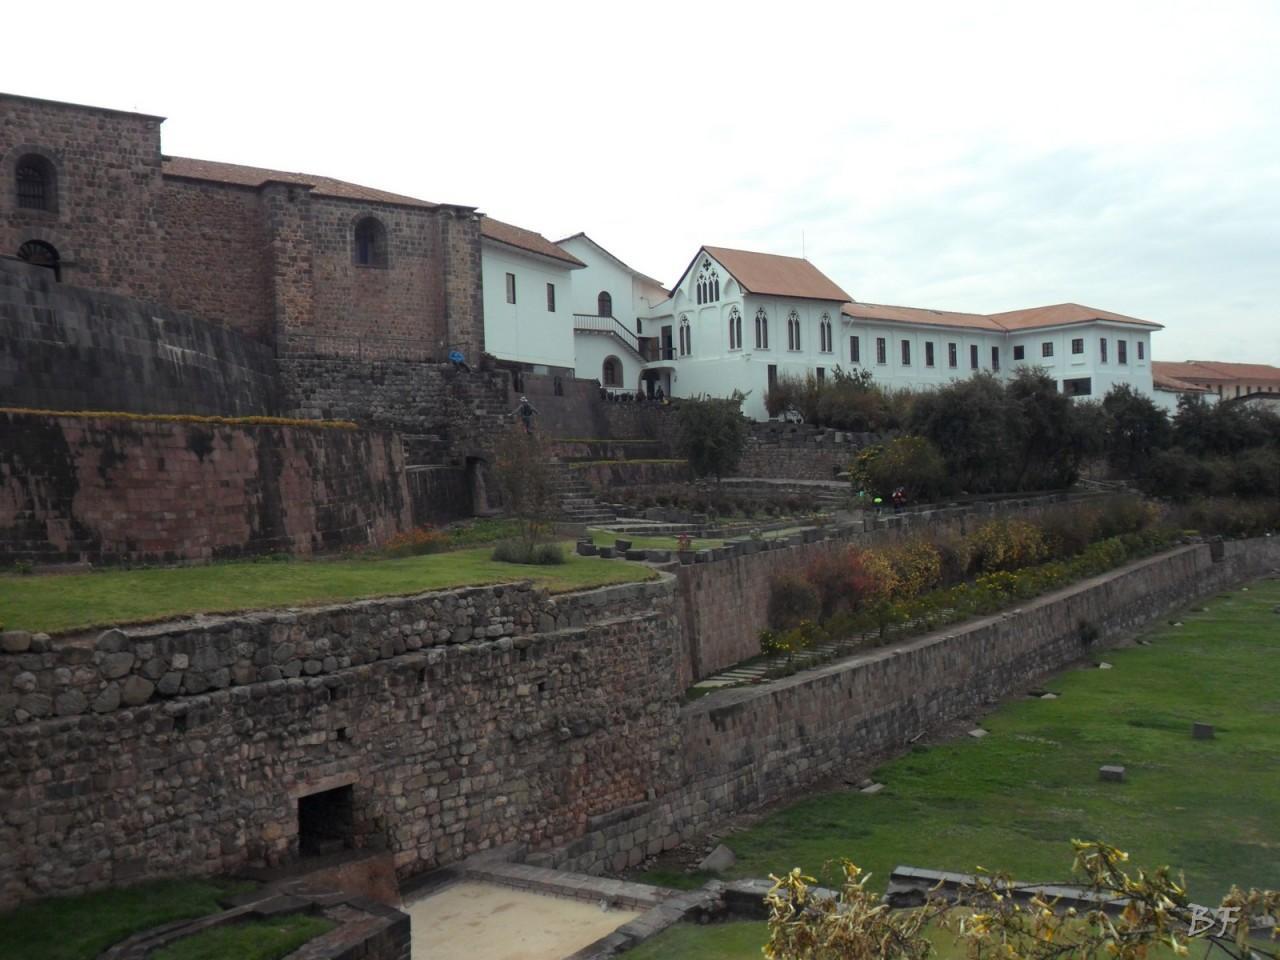 Mura-Poligonali-Megaliti-Tempio-Coricancha-Cusco-Perù-2